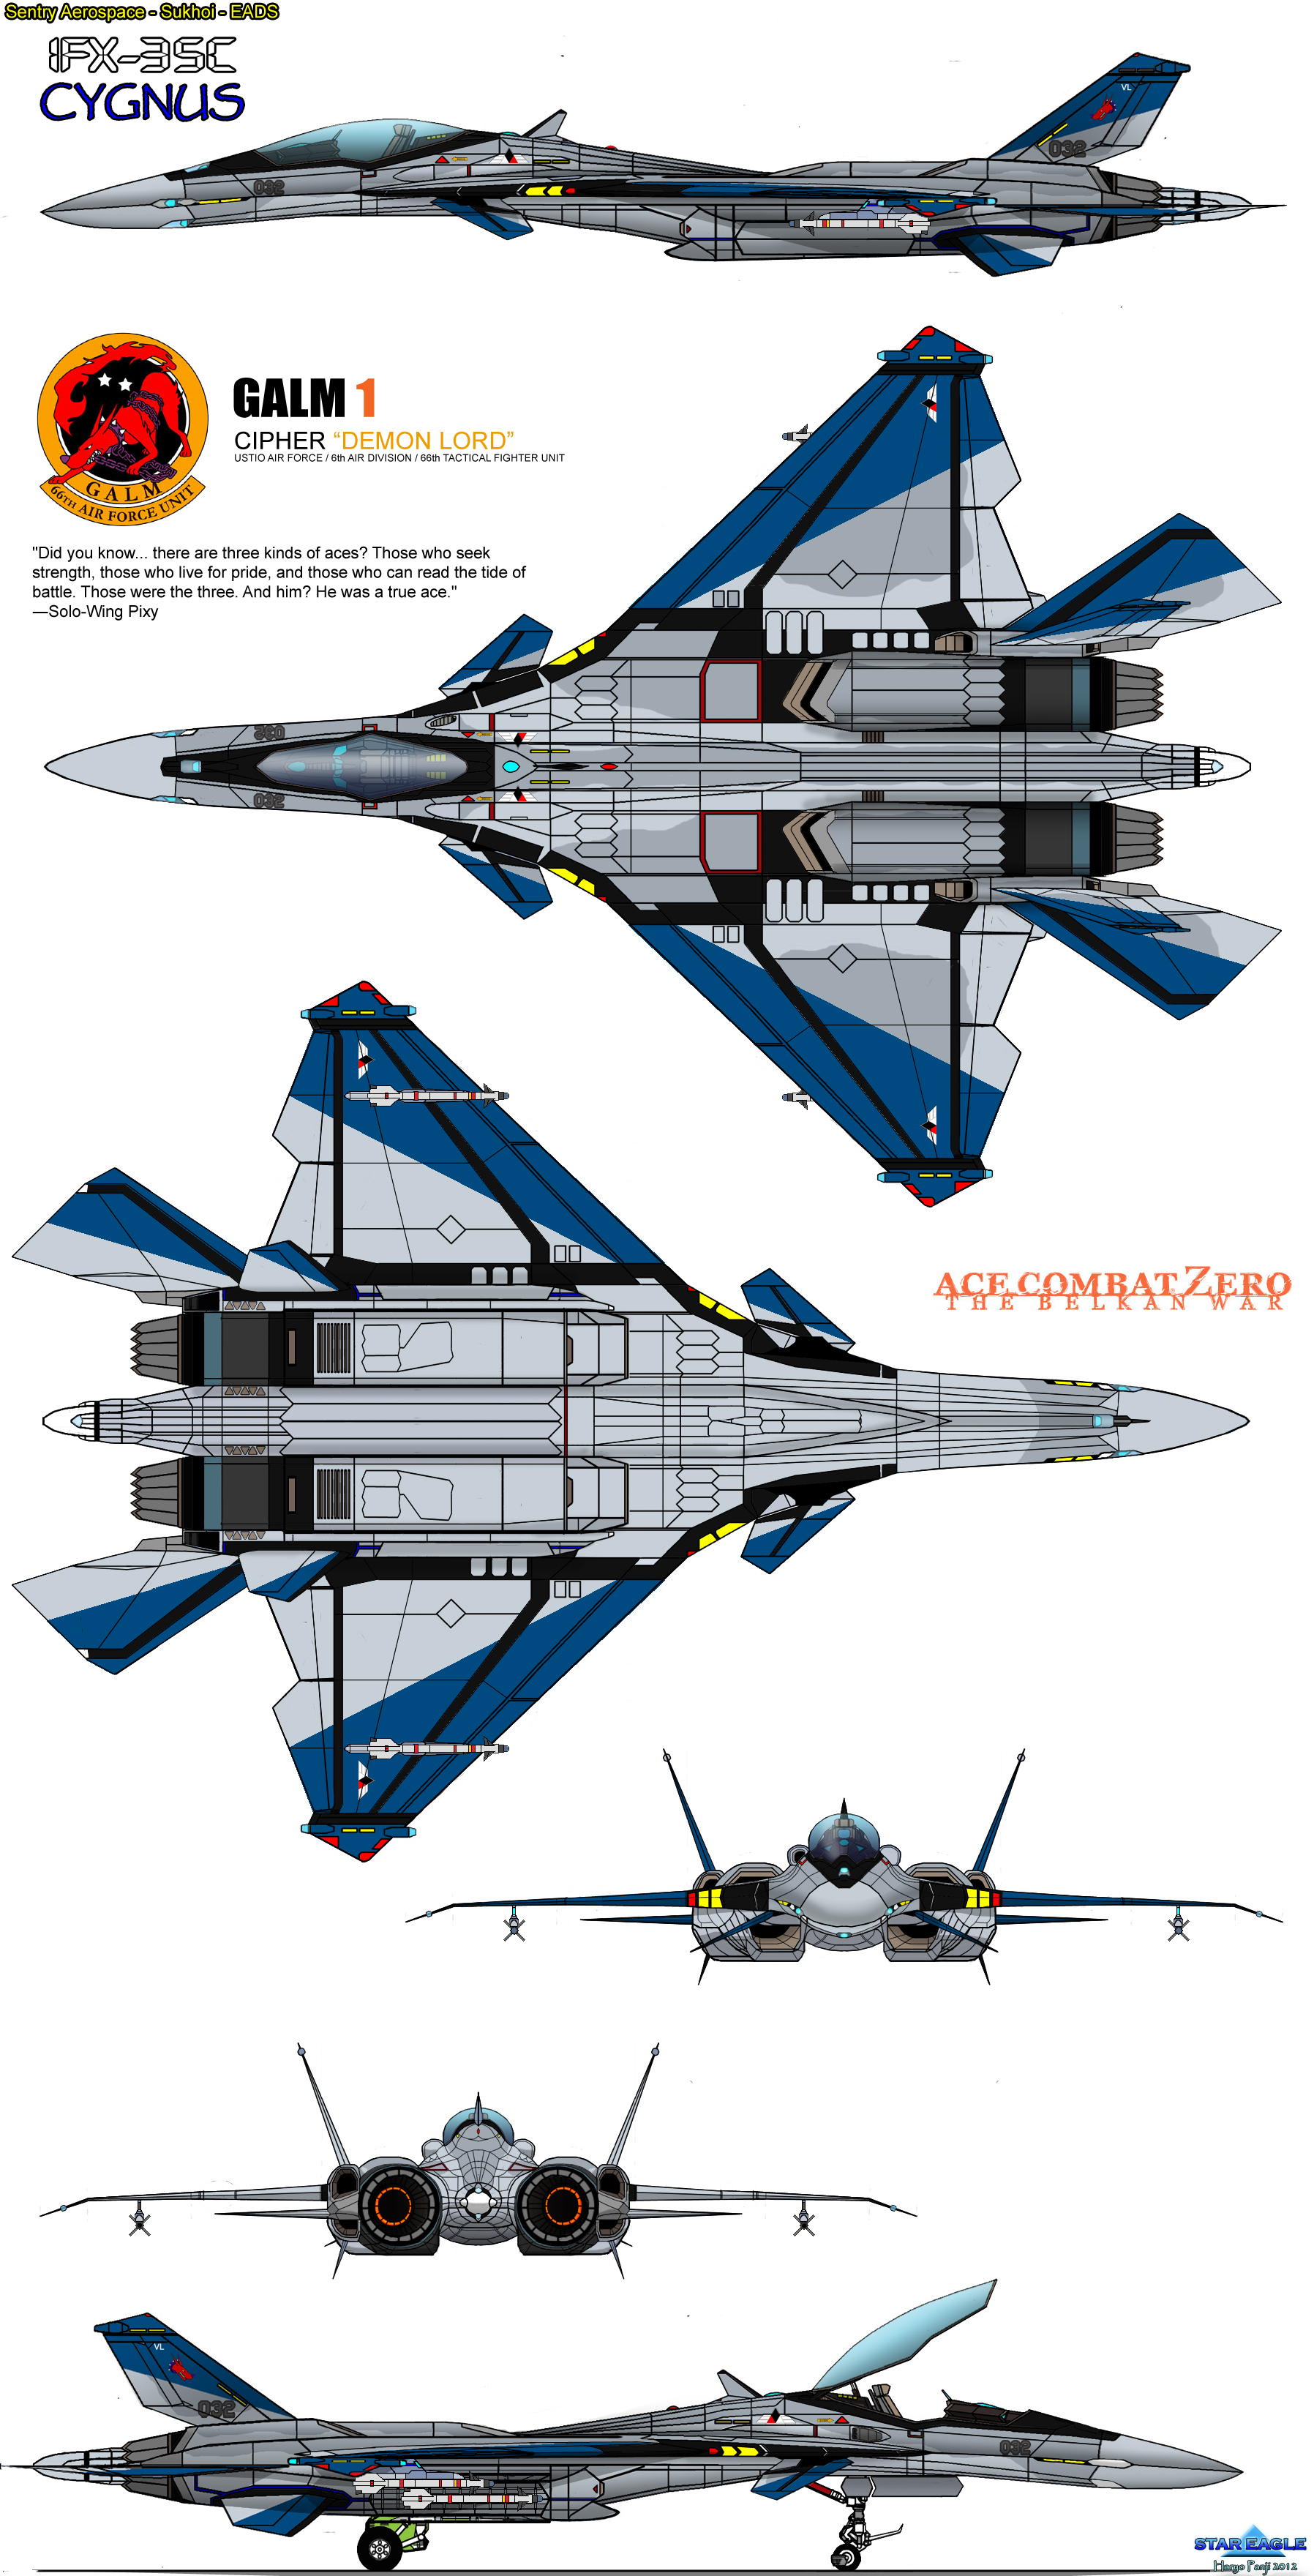 IFX-35C Cygnus GALM-1 by haryopanji